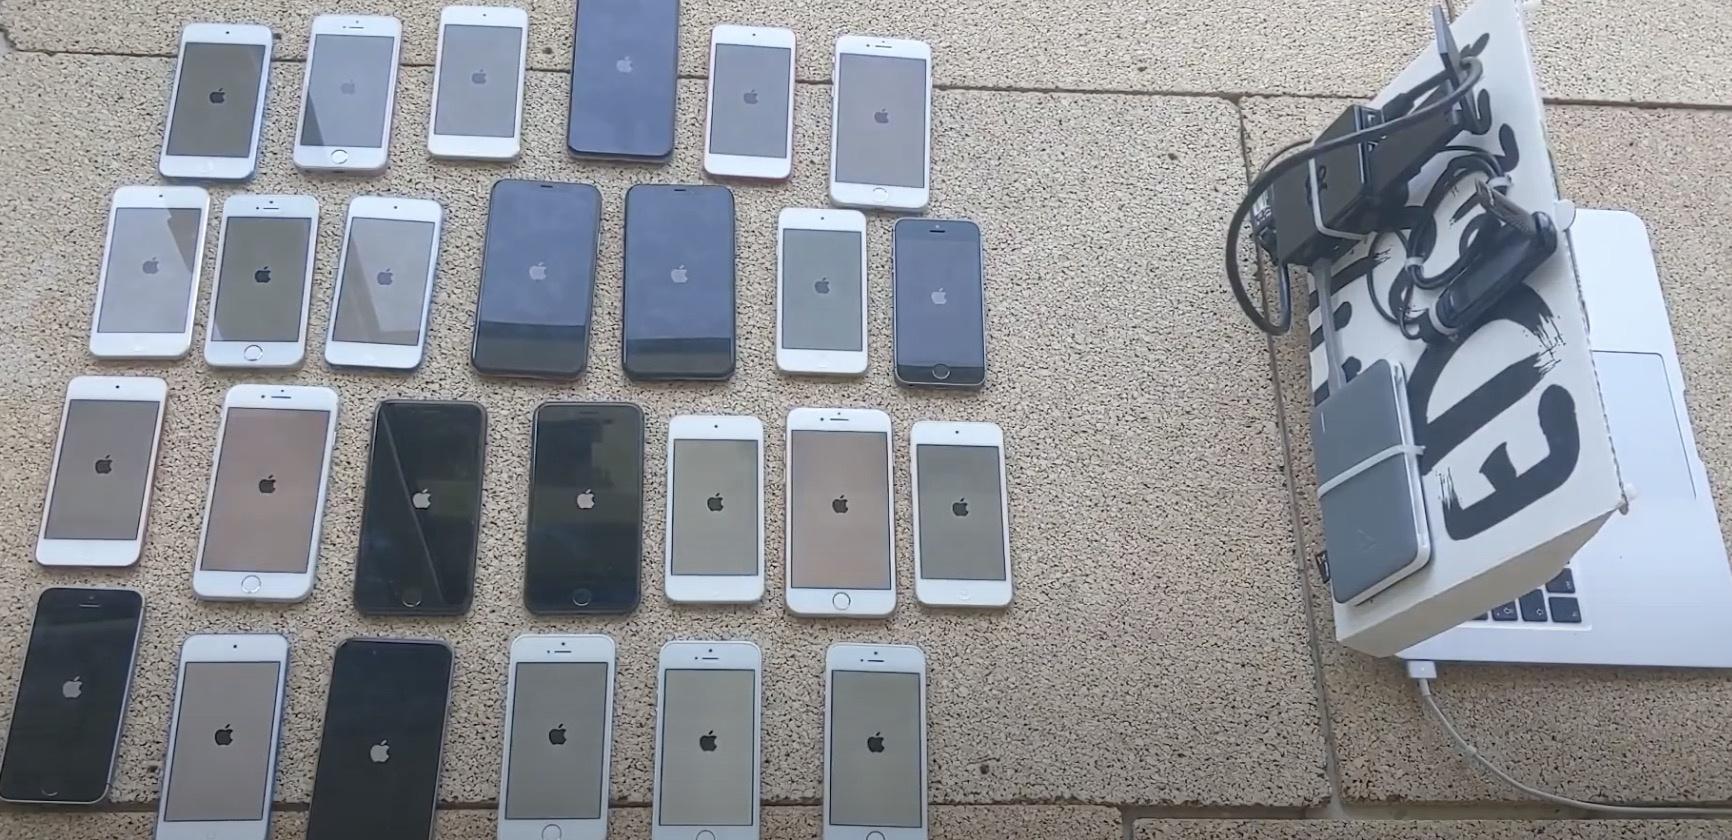 Google 开发者公开 iPhone Wi-Fi 漏洞发现过程